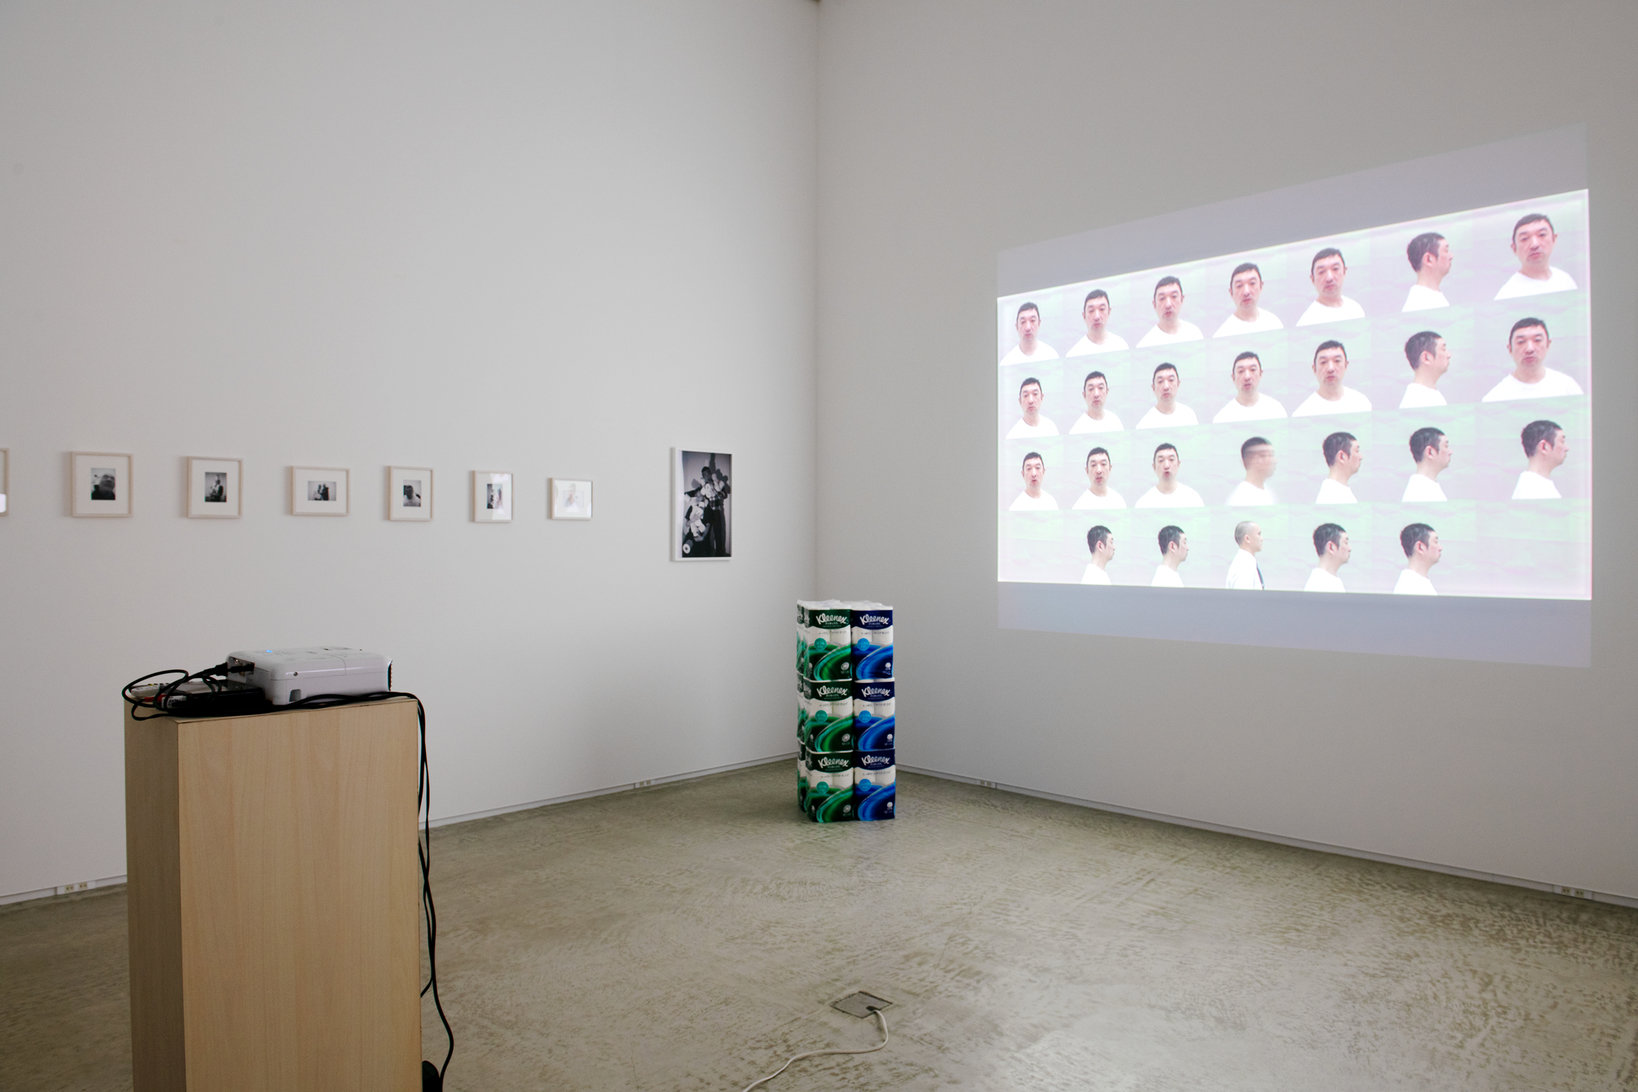 "Ken Kagami & COBRA""Romantic Comedy""2020 Installation view at MISAKO & ROSEN Courtesy of the artist and MISAKO & ROSEN, XYZ collective"